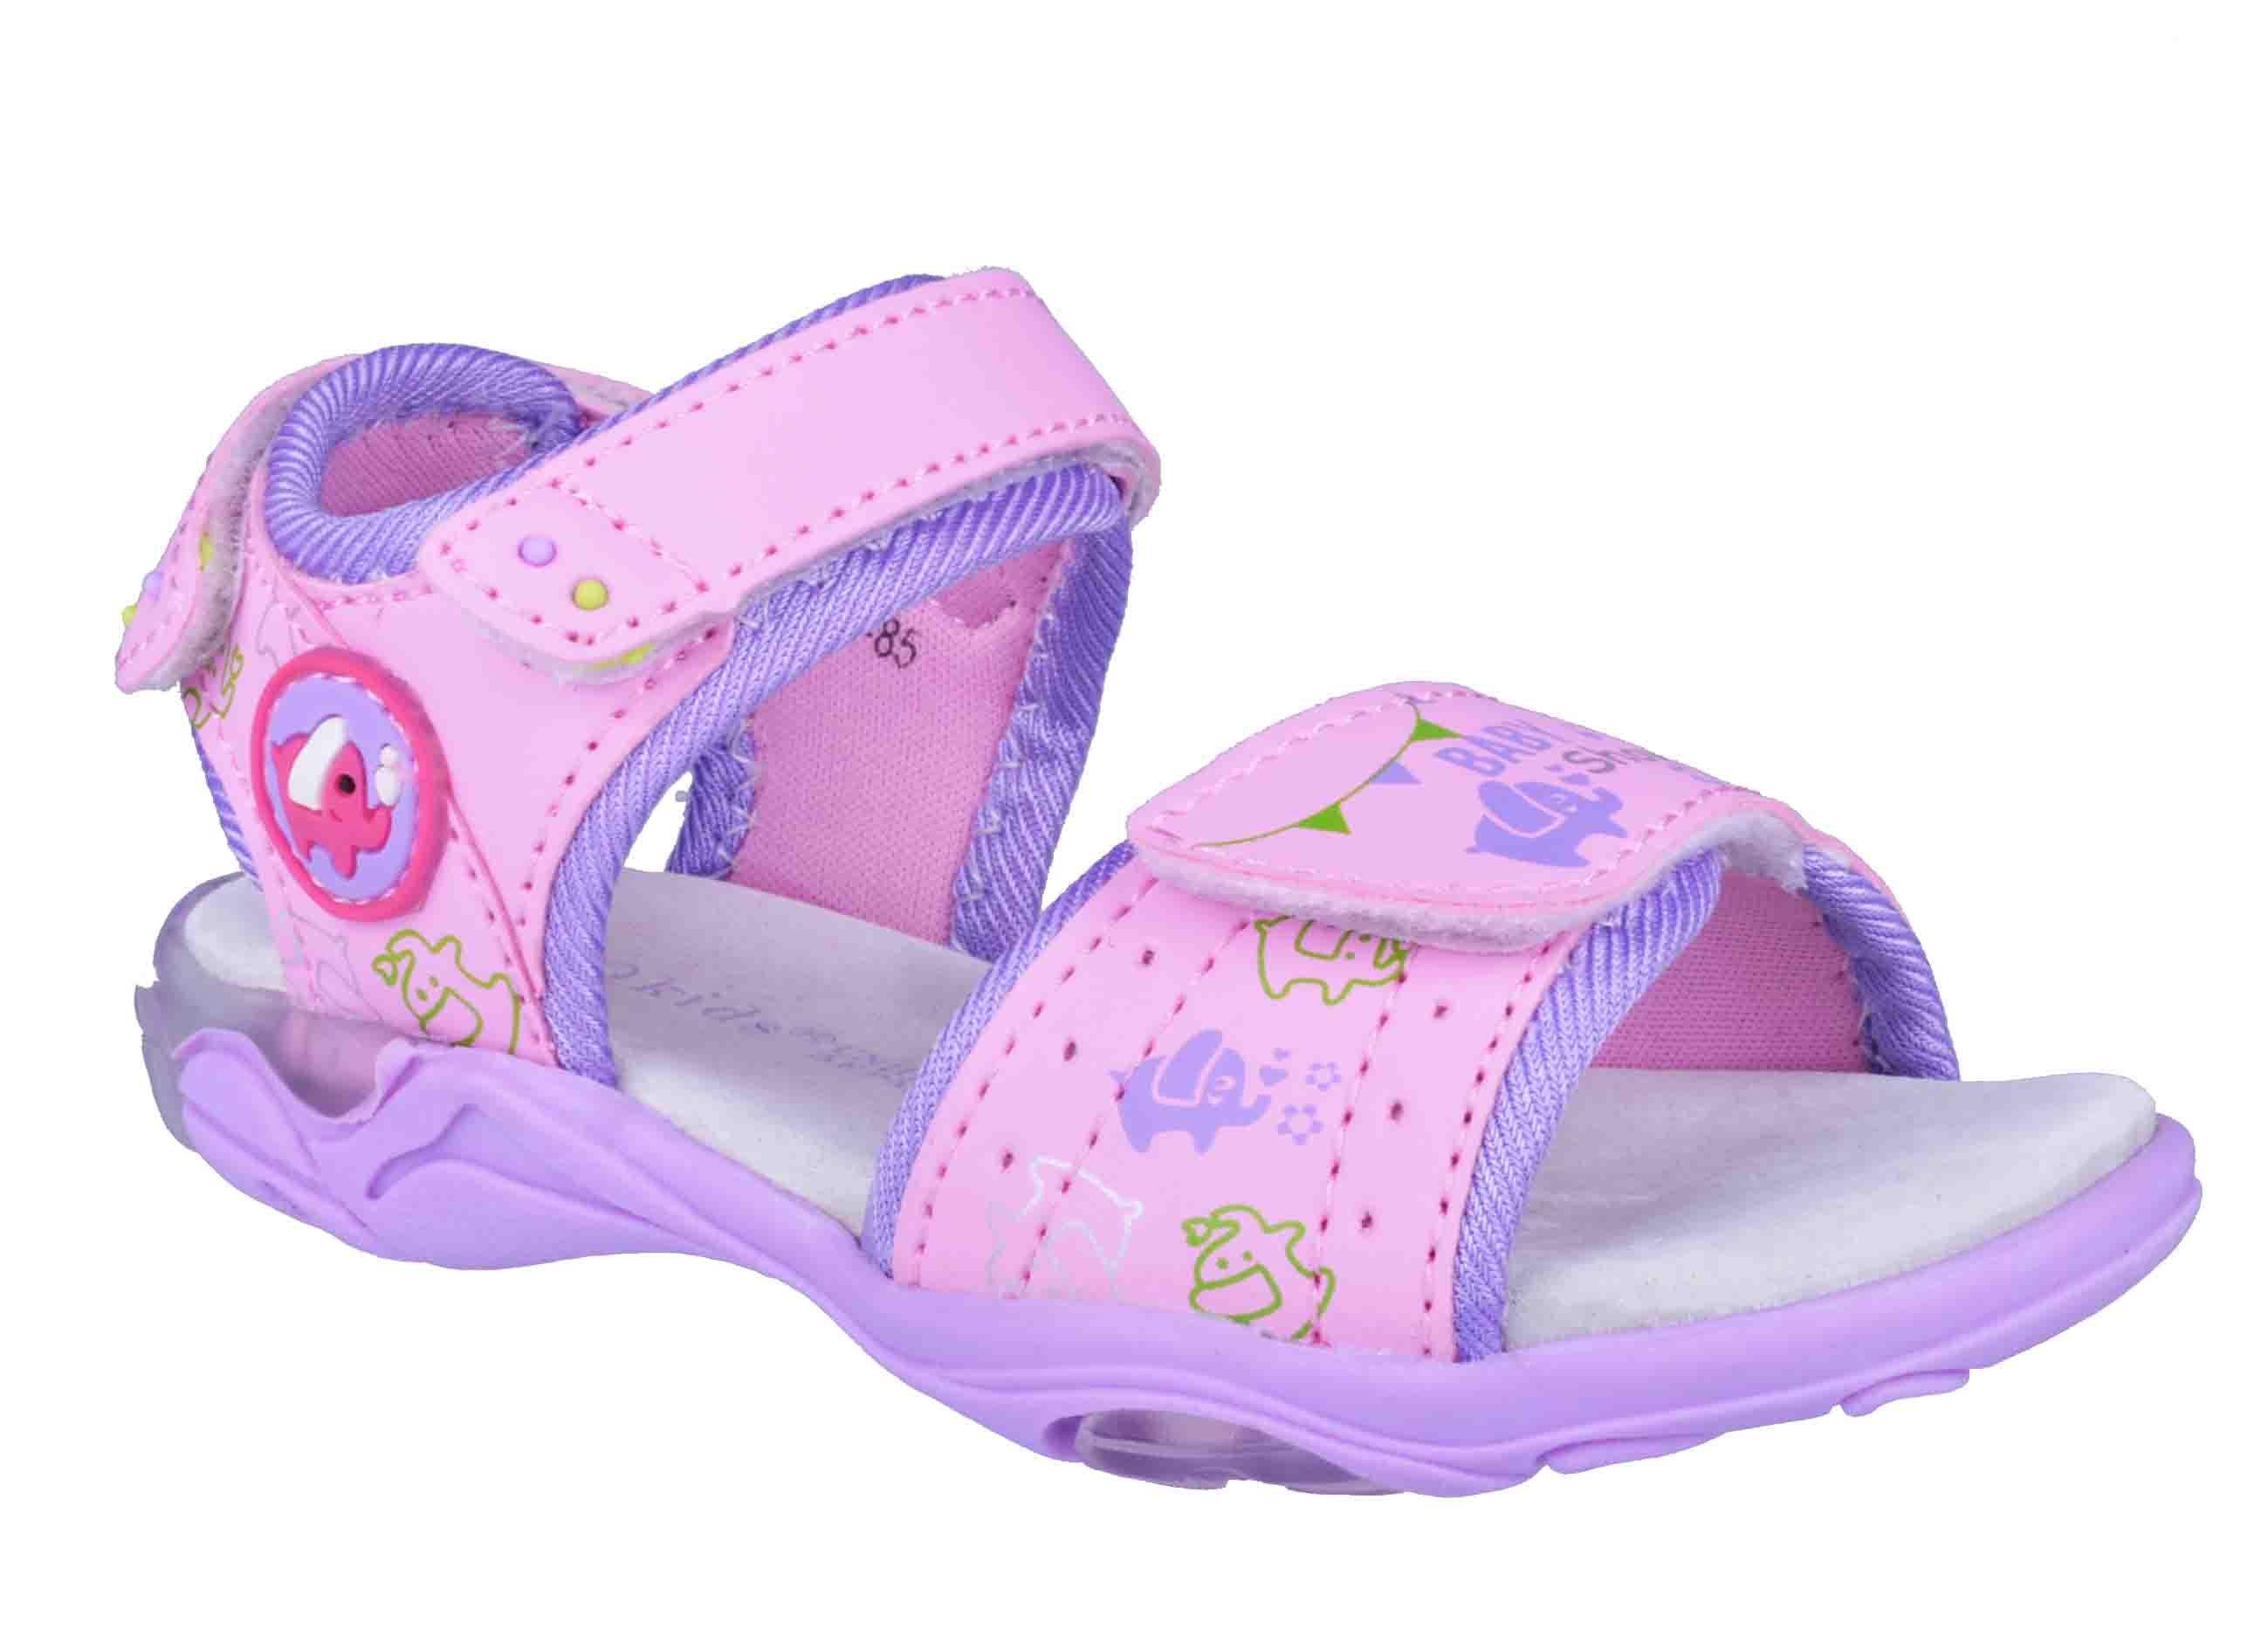 b6cd291524c Κοριτσιστικα Πεδιλα IQ Kids Klarisa Ροζ | Apostolidis Shoes